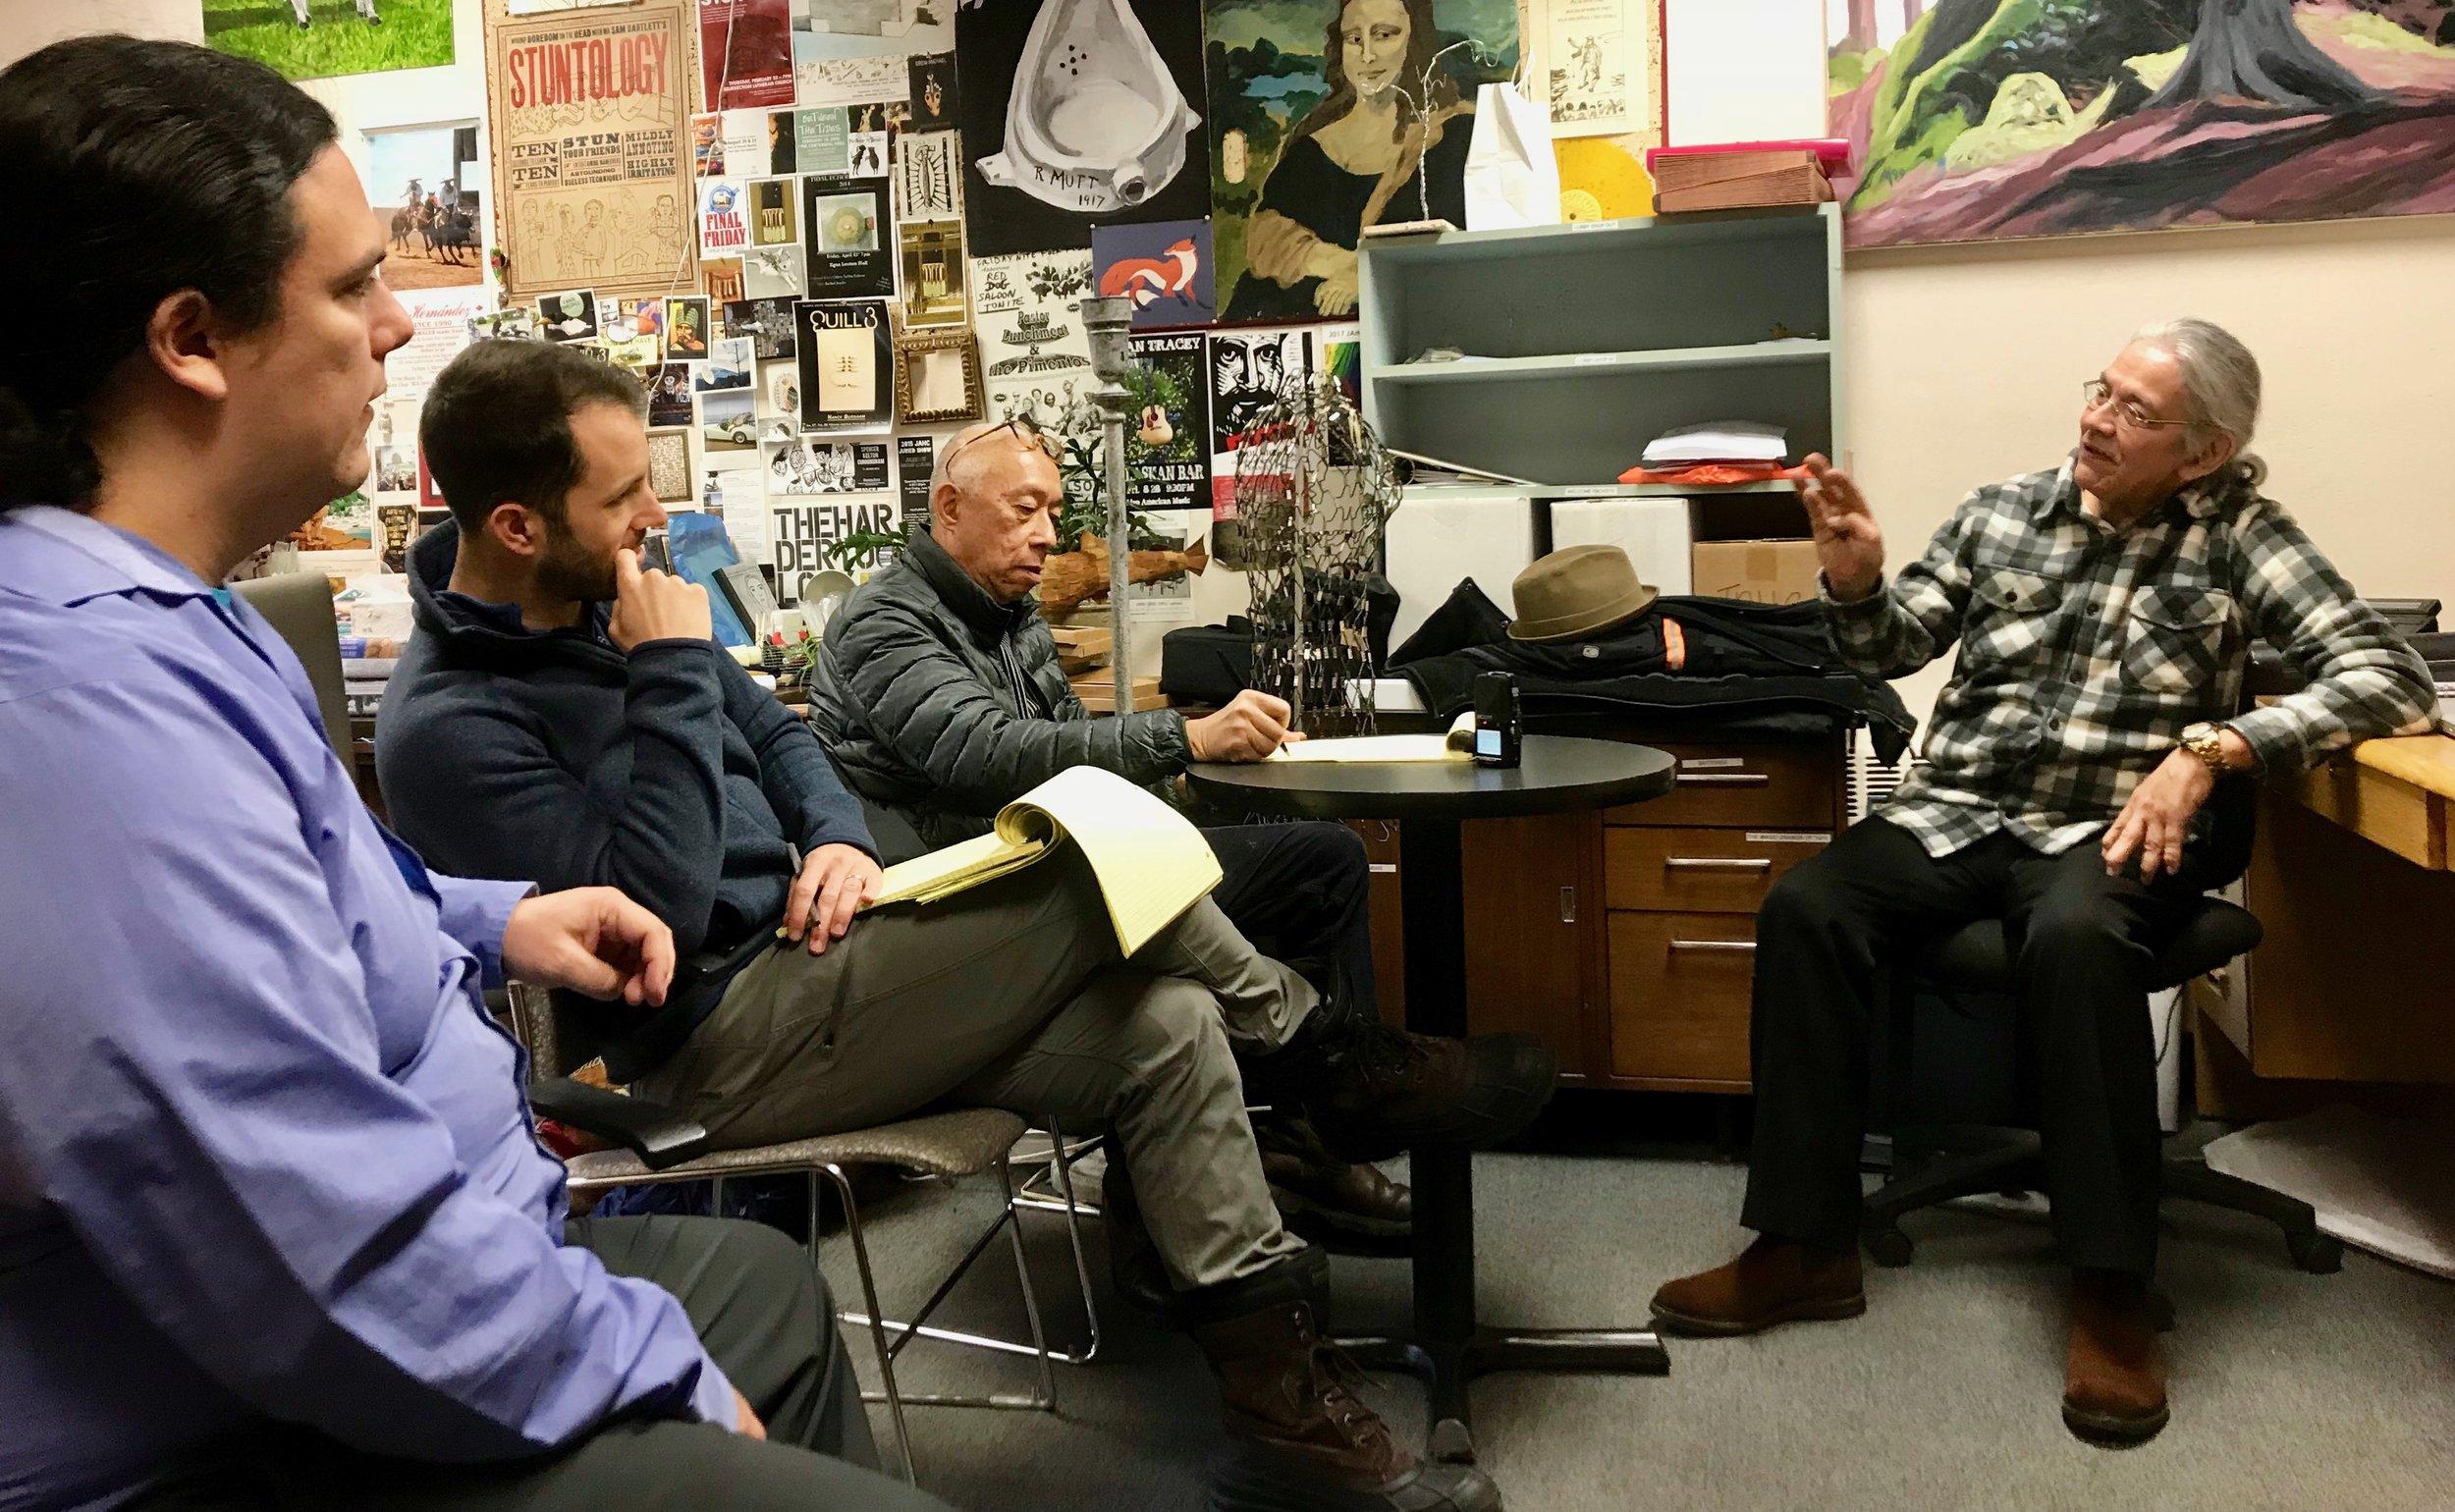 Frank Kaash Katasse, Ryan Conarro, Ping Chong, and Walter Soboleff Jr. at the Juneau Arts & Culture Center, February 2018